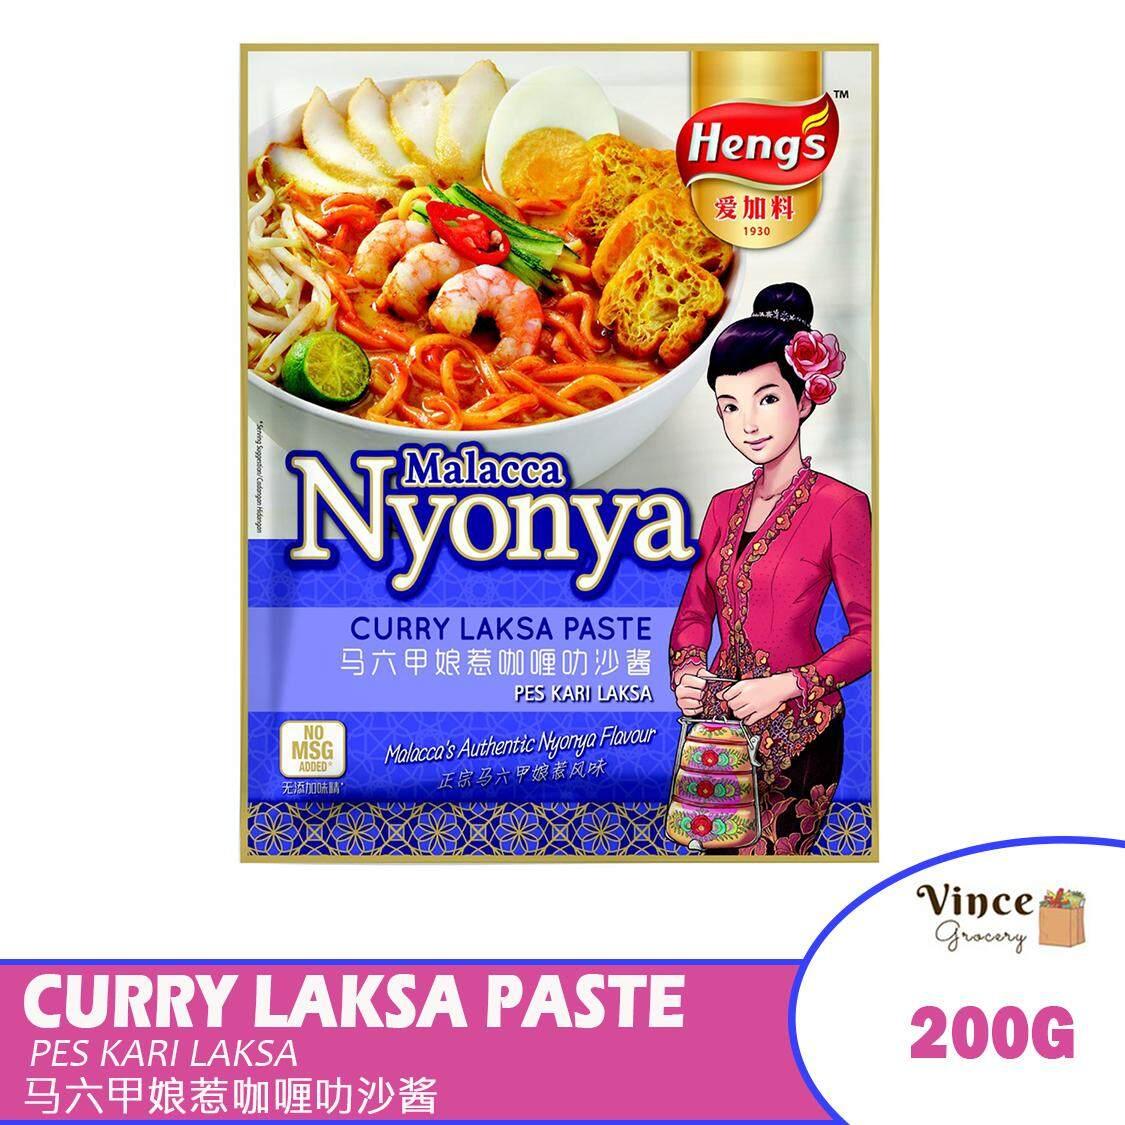 HENG'S Malacca Nyonya Curry Laksa Paste  Pes Laksa Nyonya  马六甲娘惹咖喱叻沙酱 200G